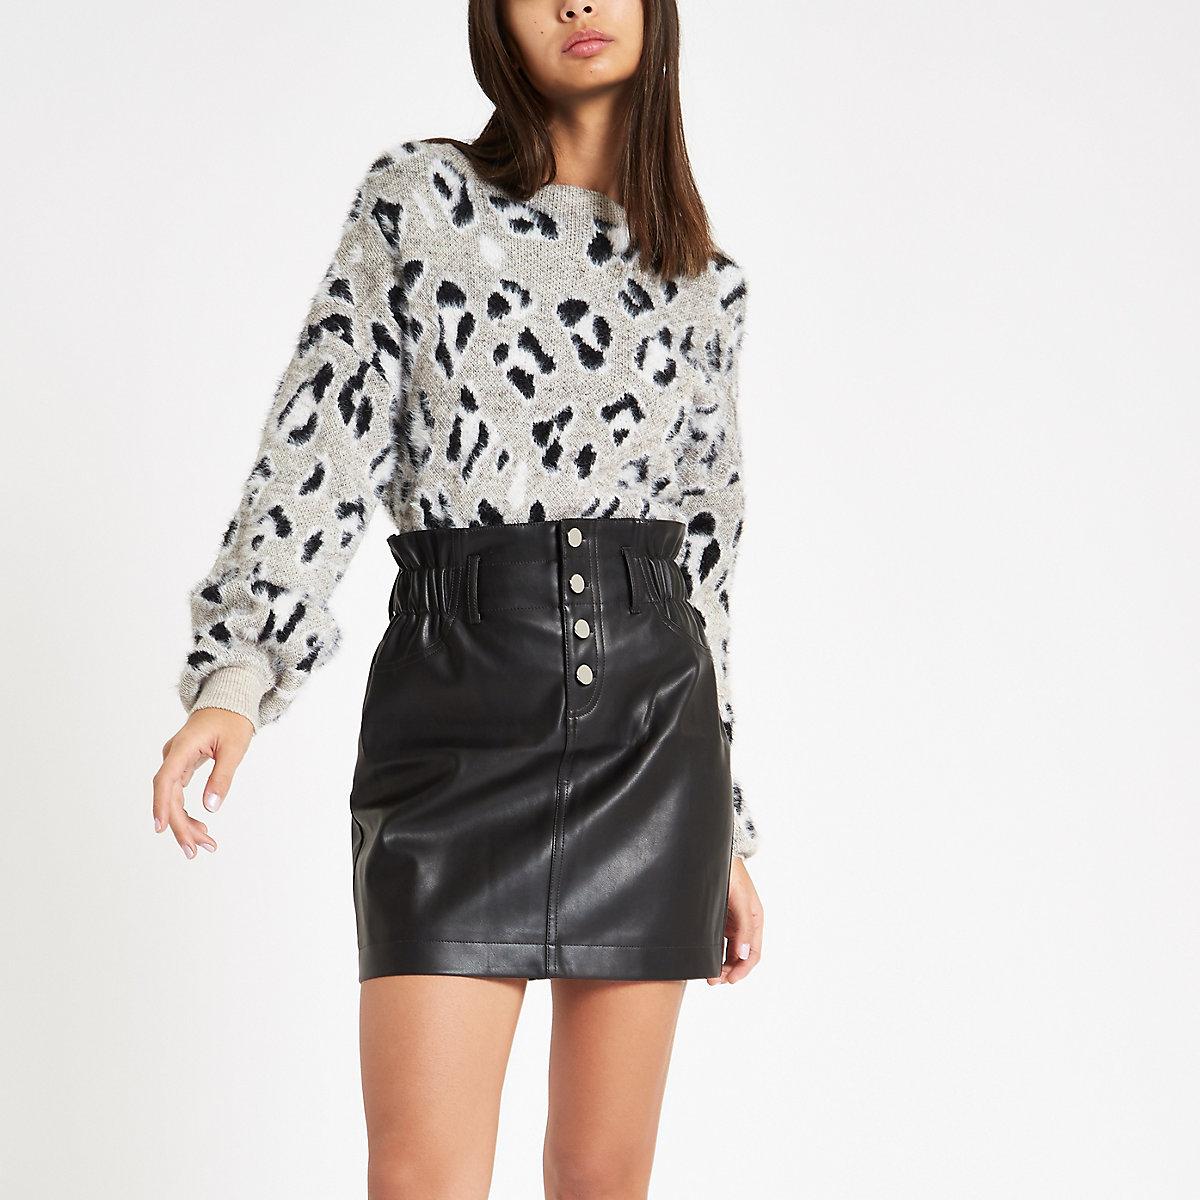 Black faux leather button front mini skirt